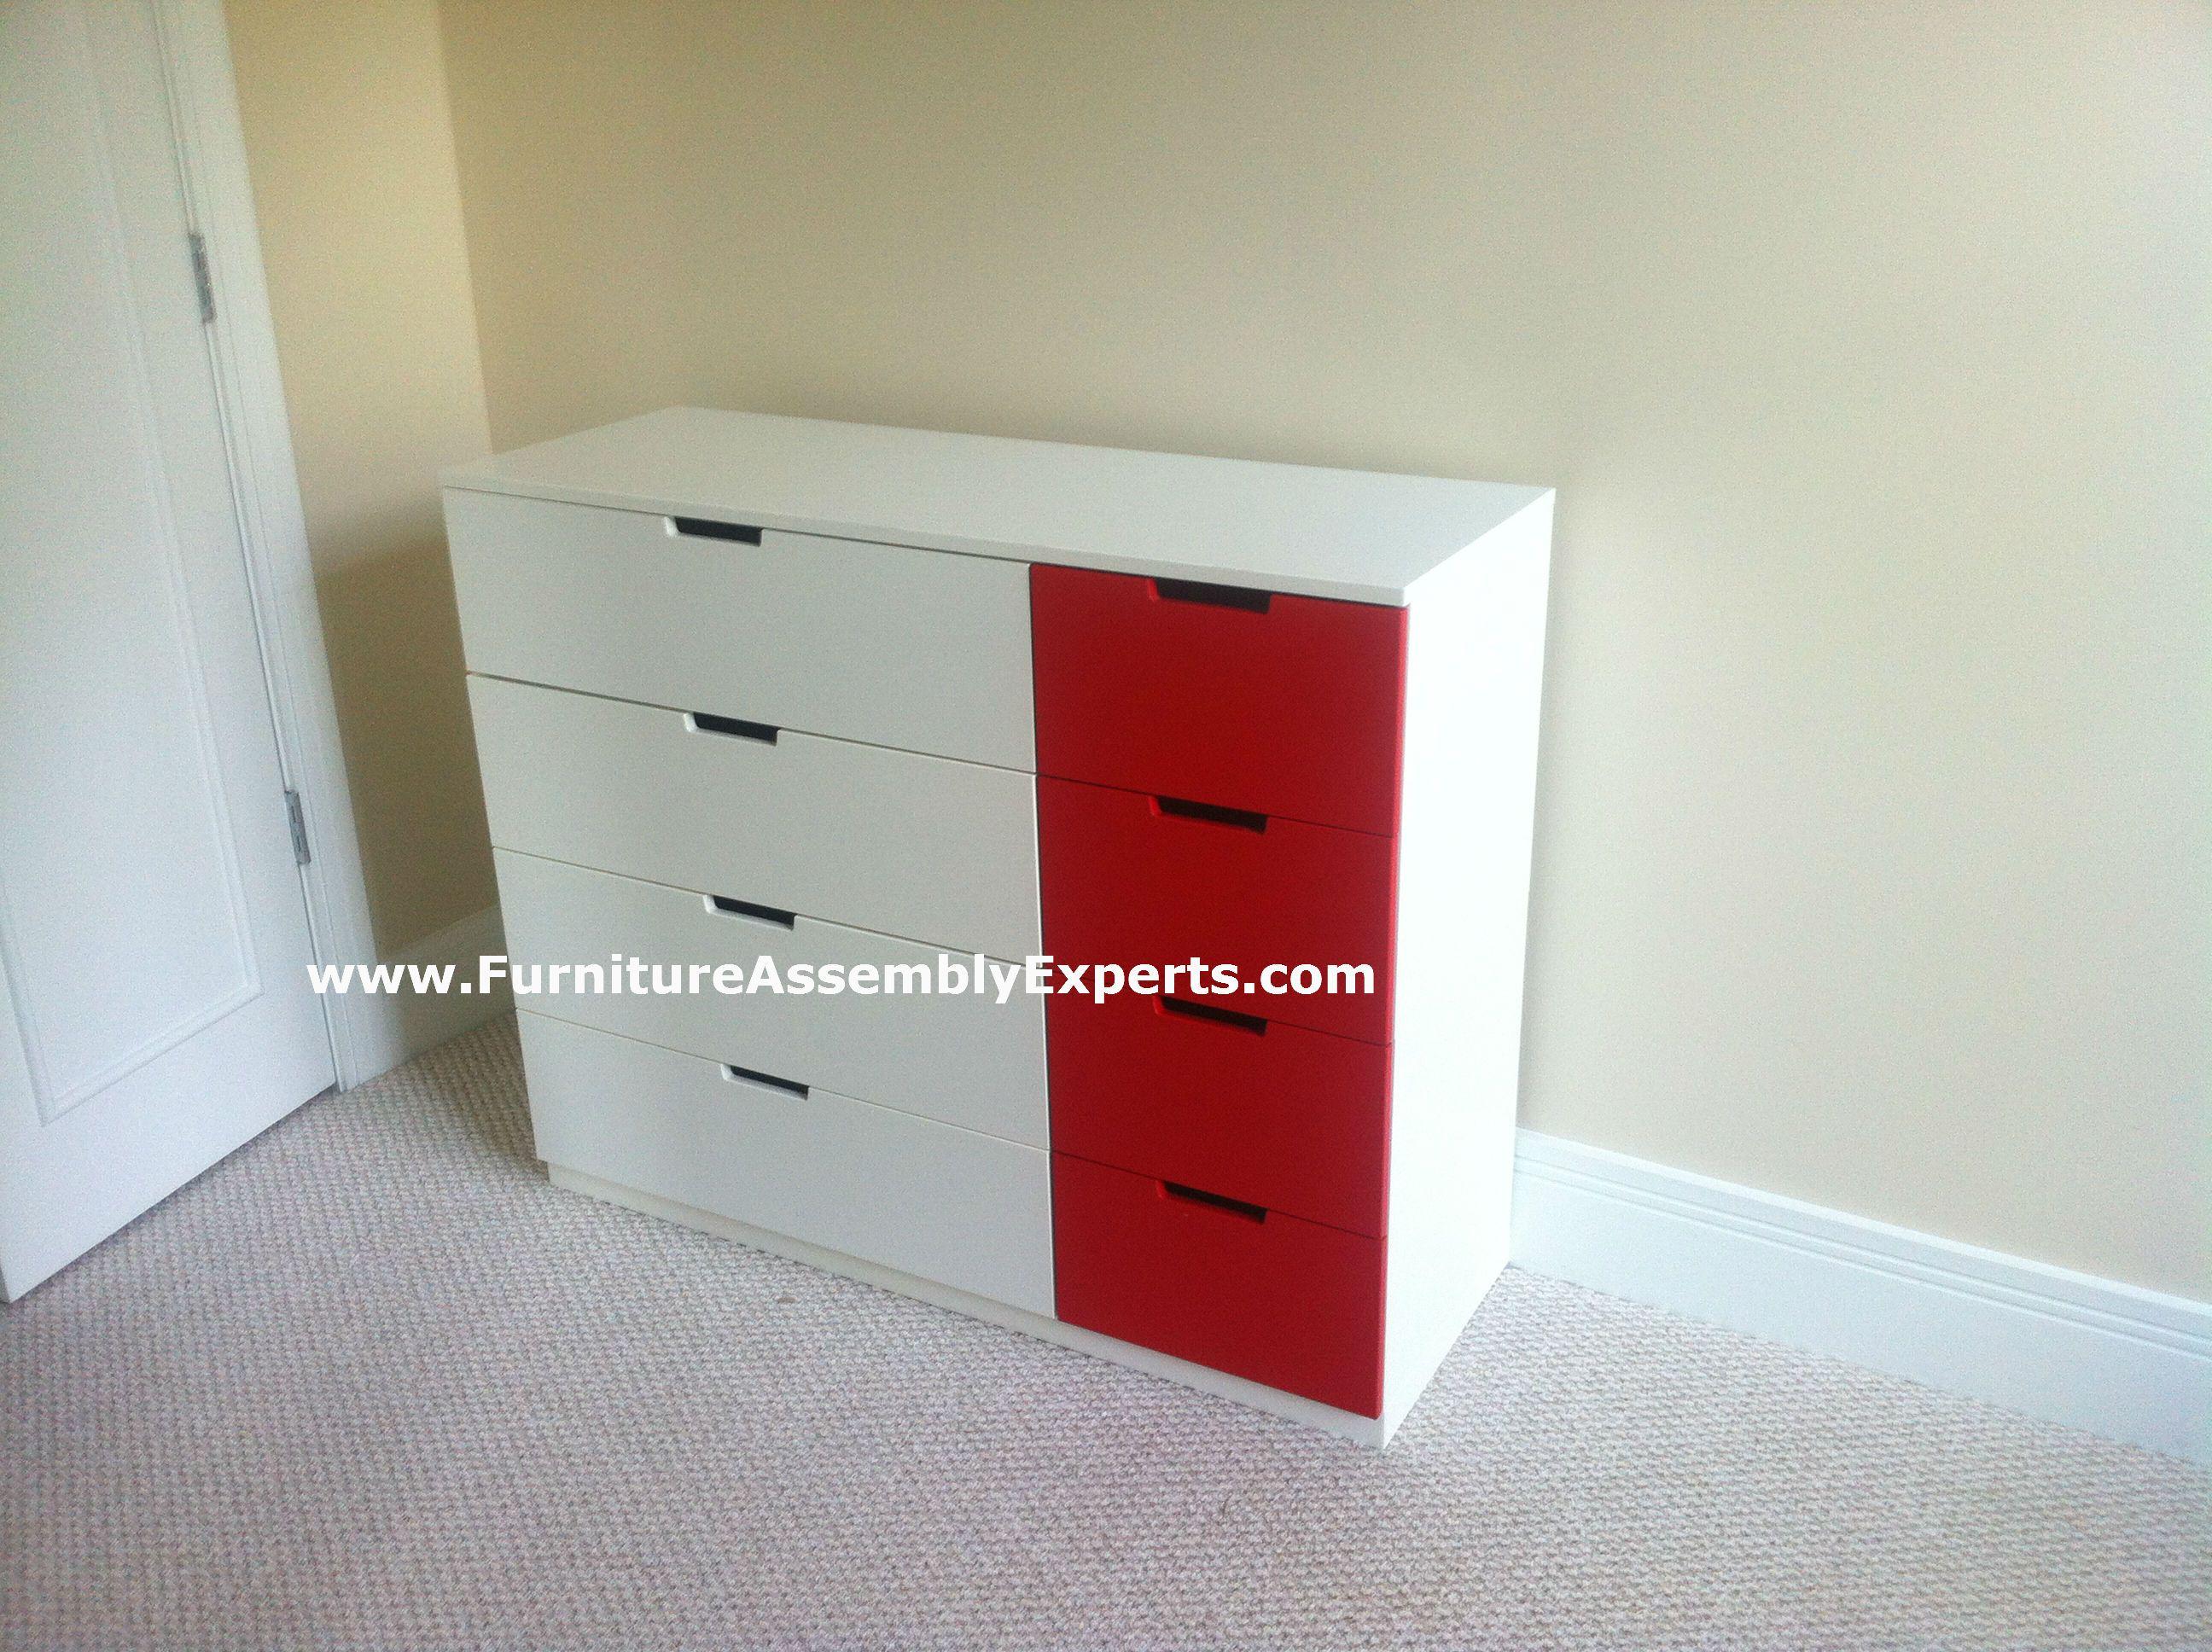 Ikea nordli 8 drawer dresser assembled in arlington va by for Ikea arlington va